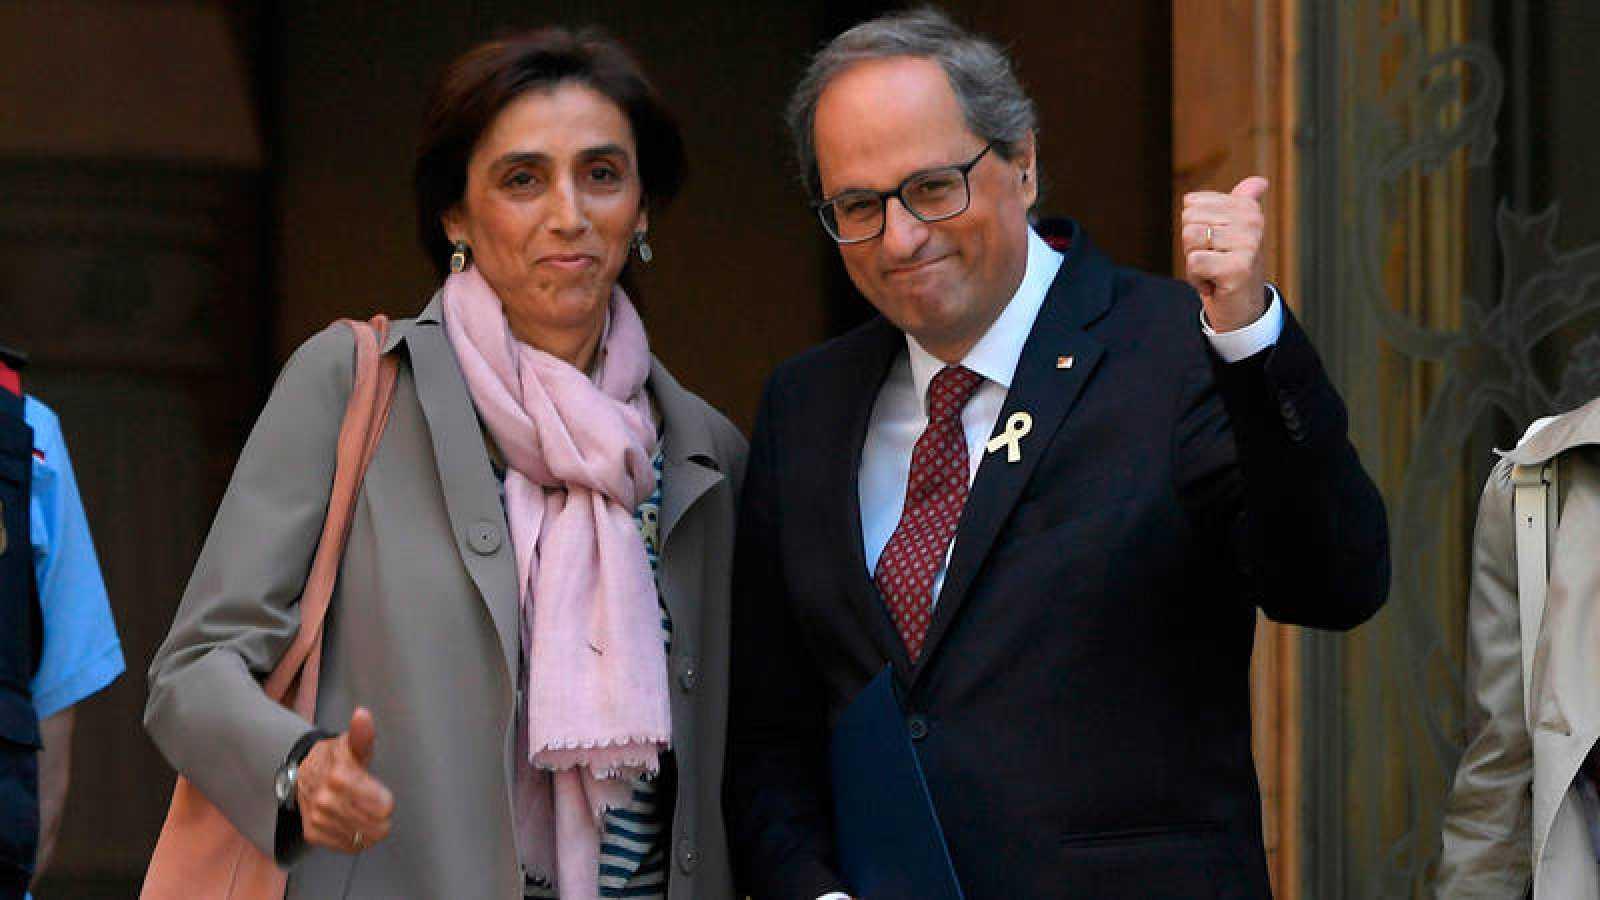 El presidente de la Generalitat, Quim Torra, a las puertas del TSJC